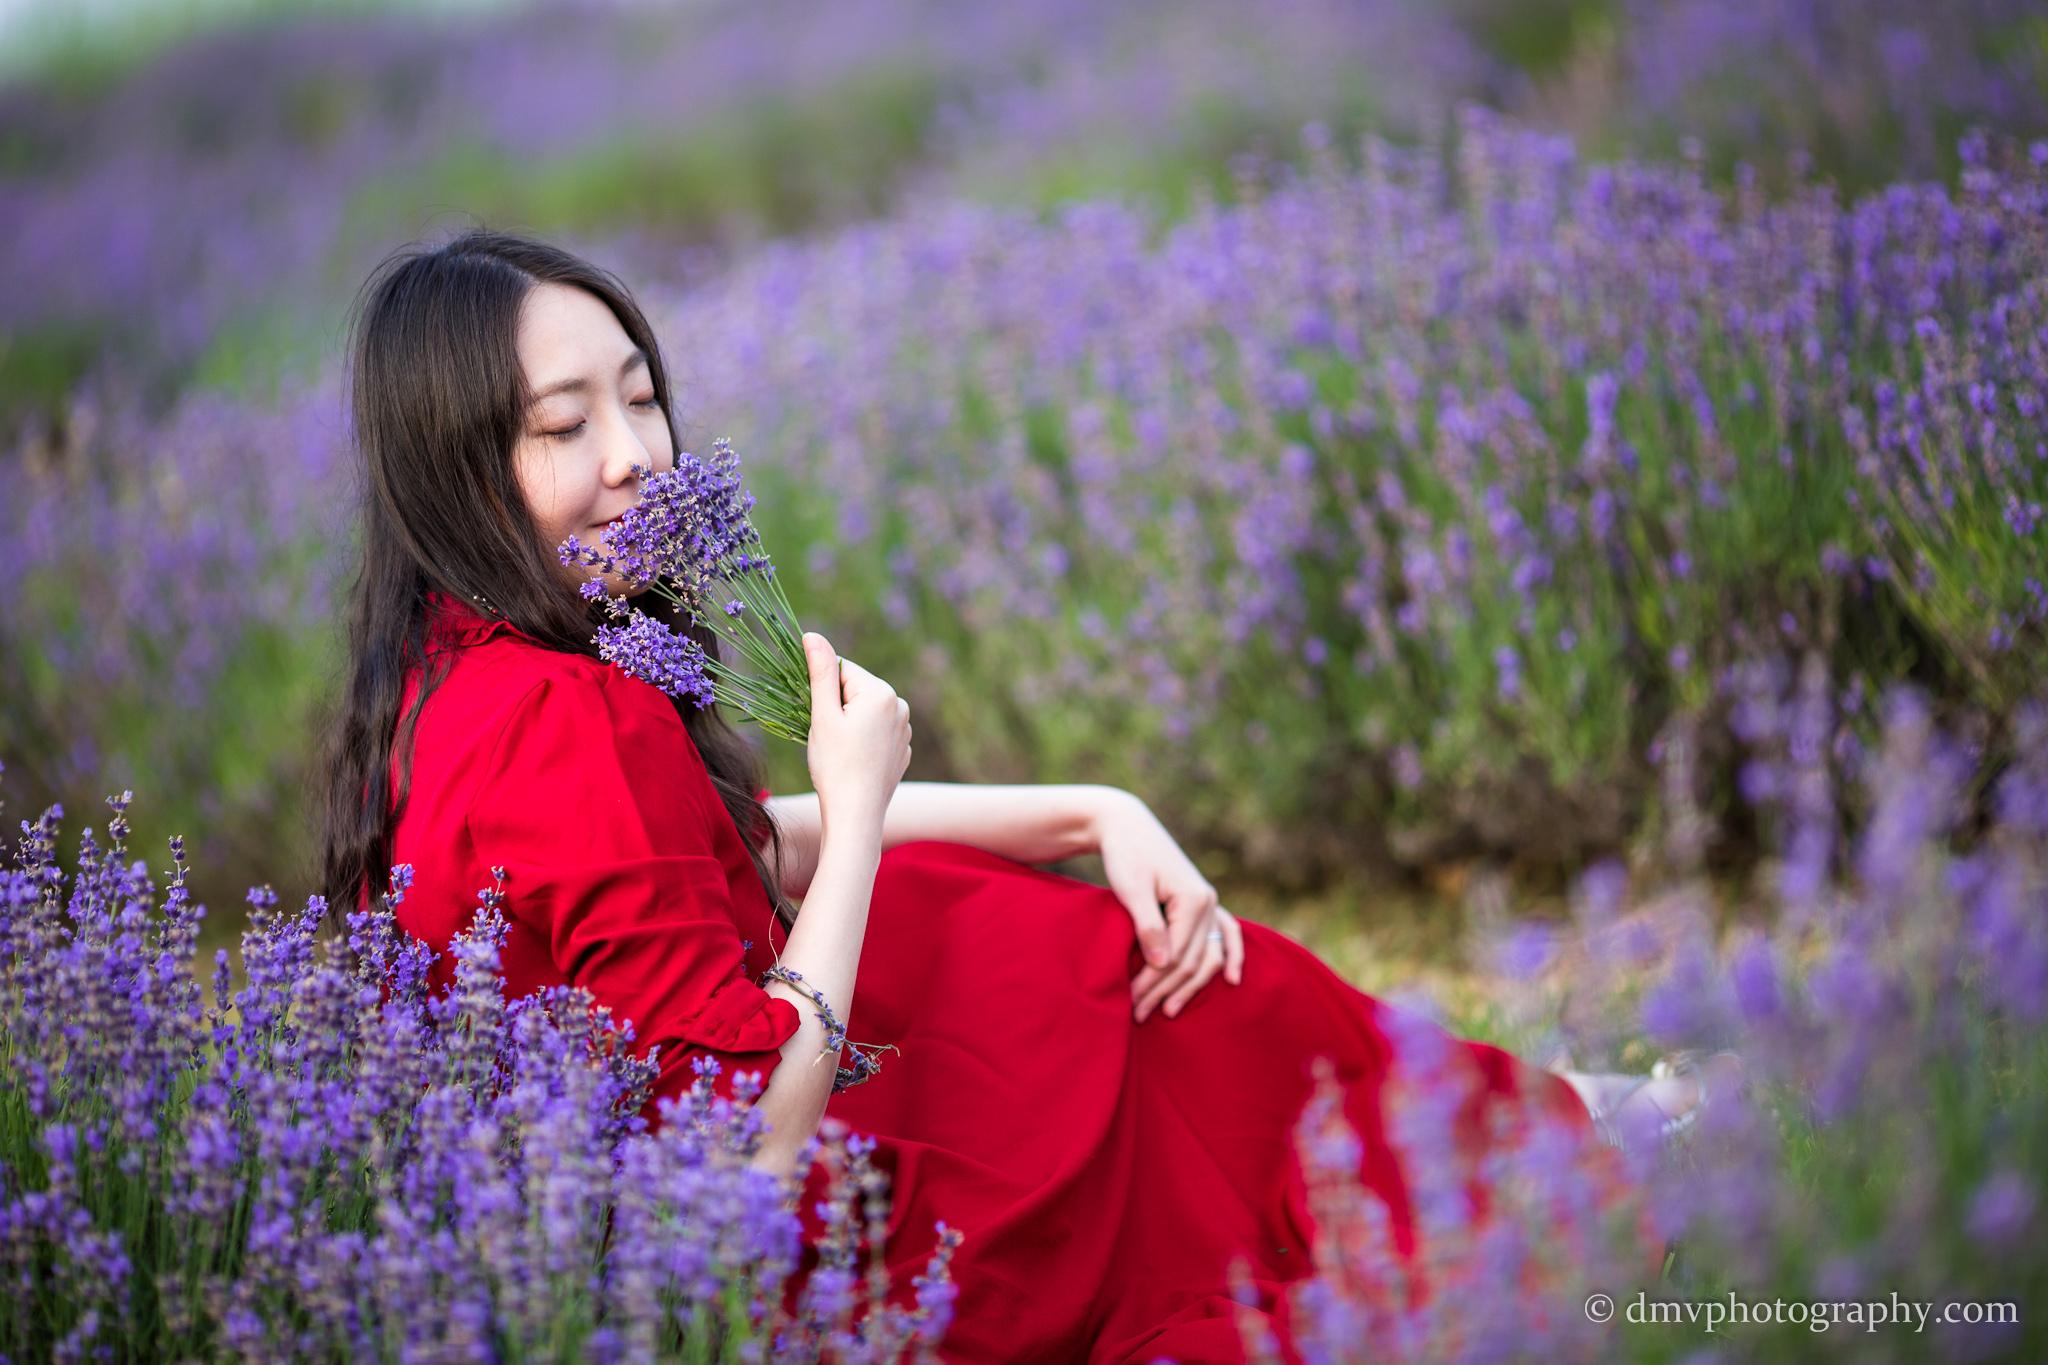 2016-06-24 - Zhu Xing - Lavender Field - 00052